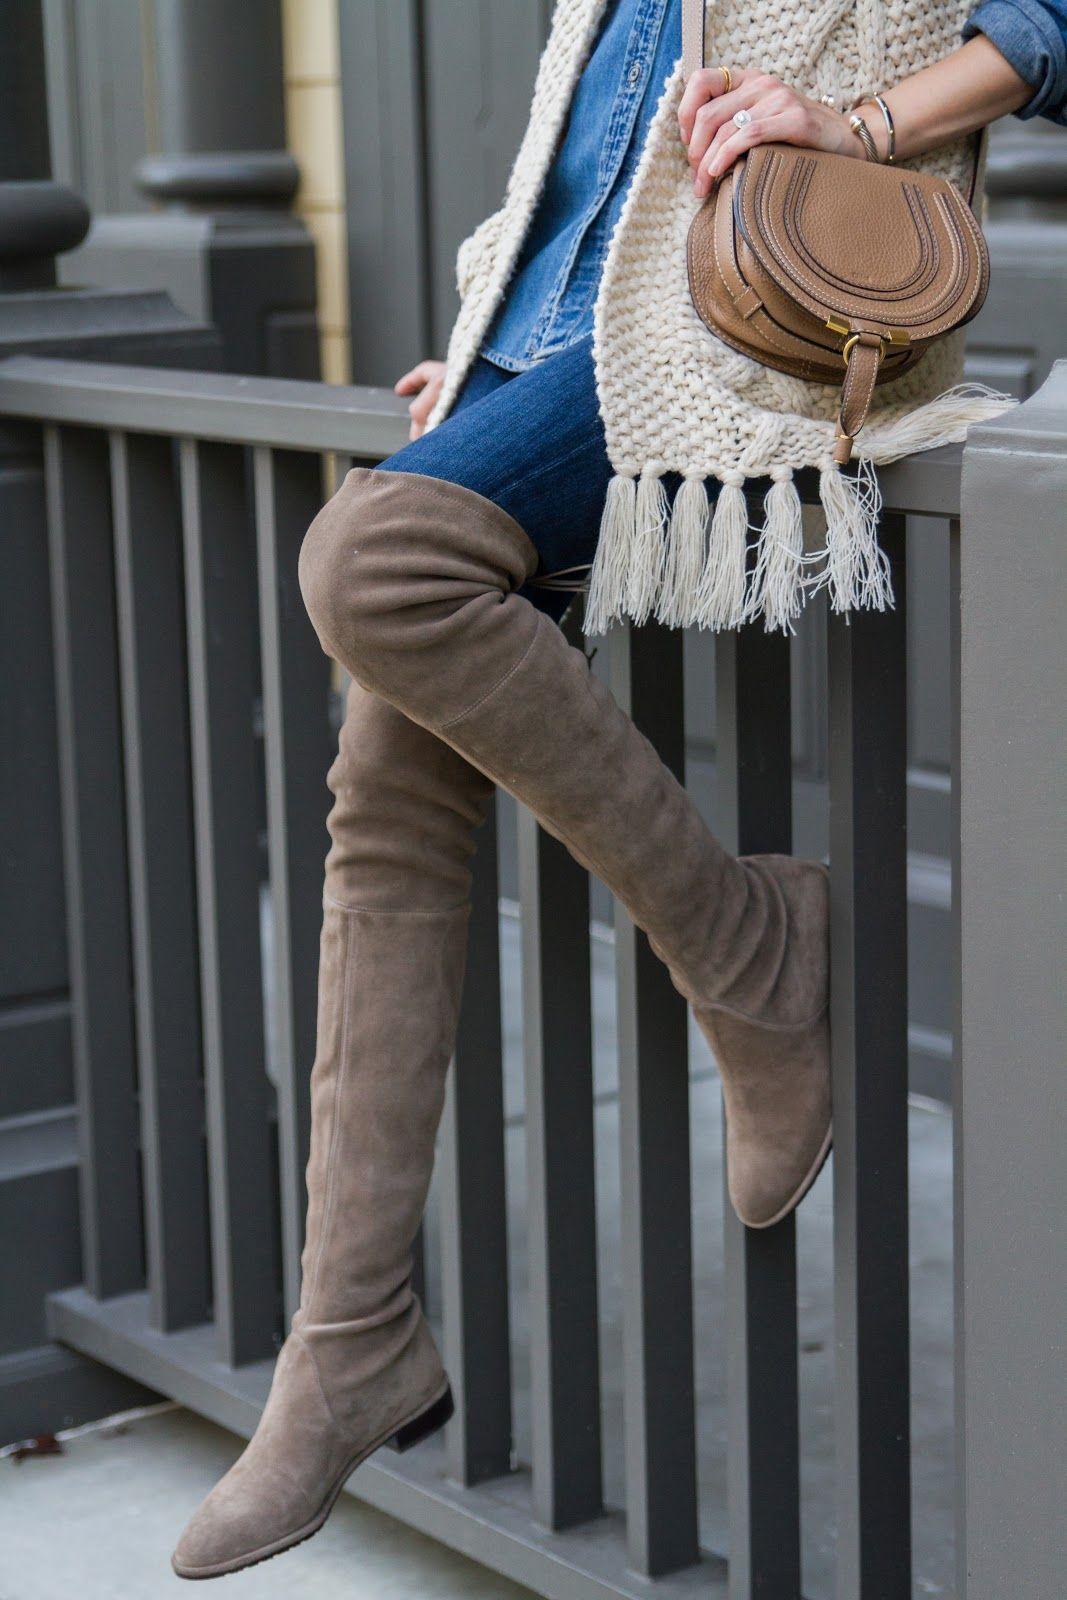 e27f6e69ad Stuart Weitzman Lowland boots | My Style | Stewart weitzman boots ...